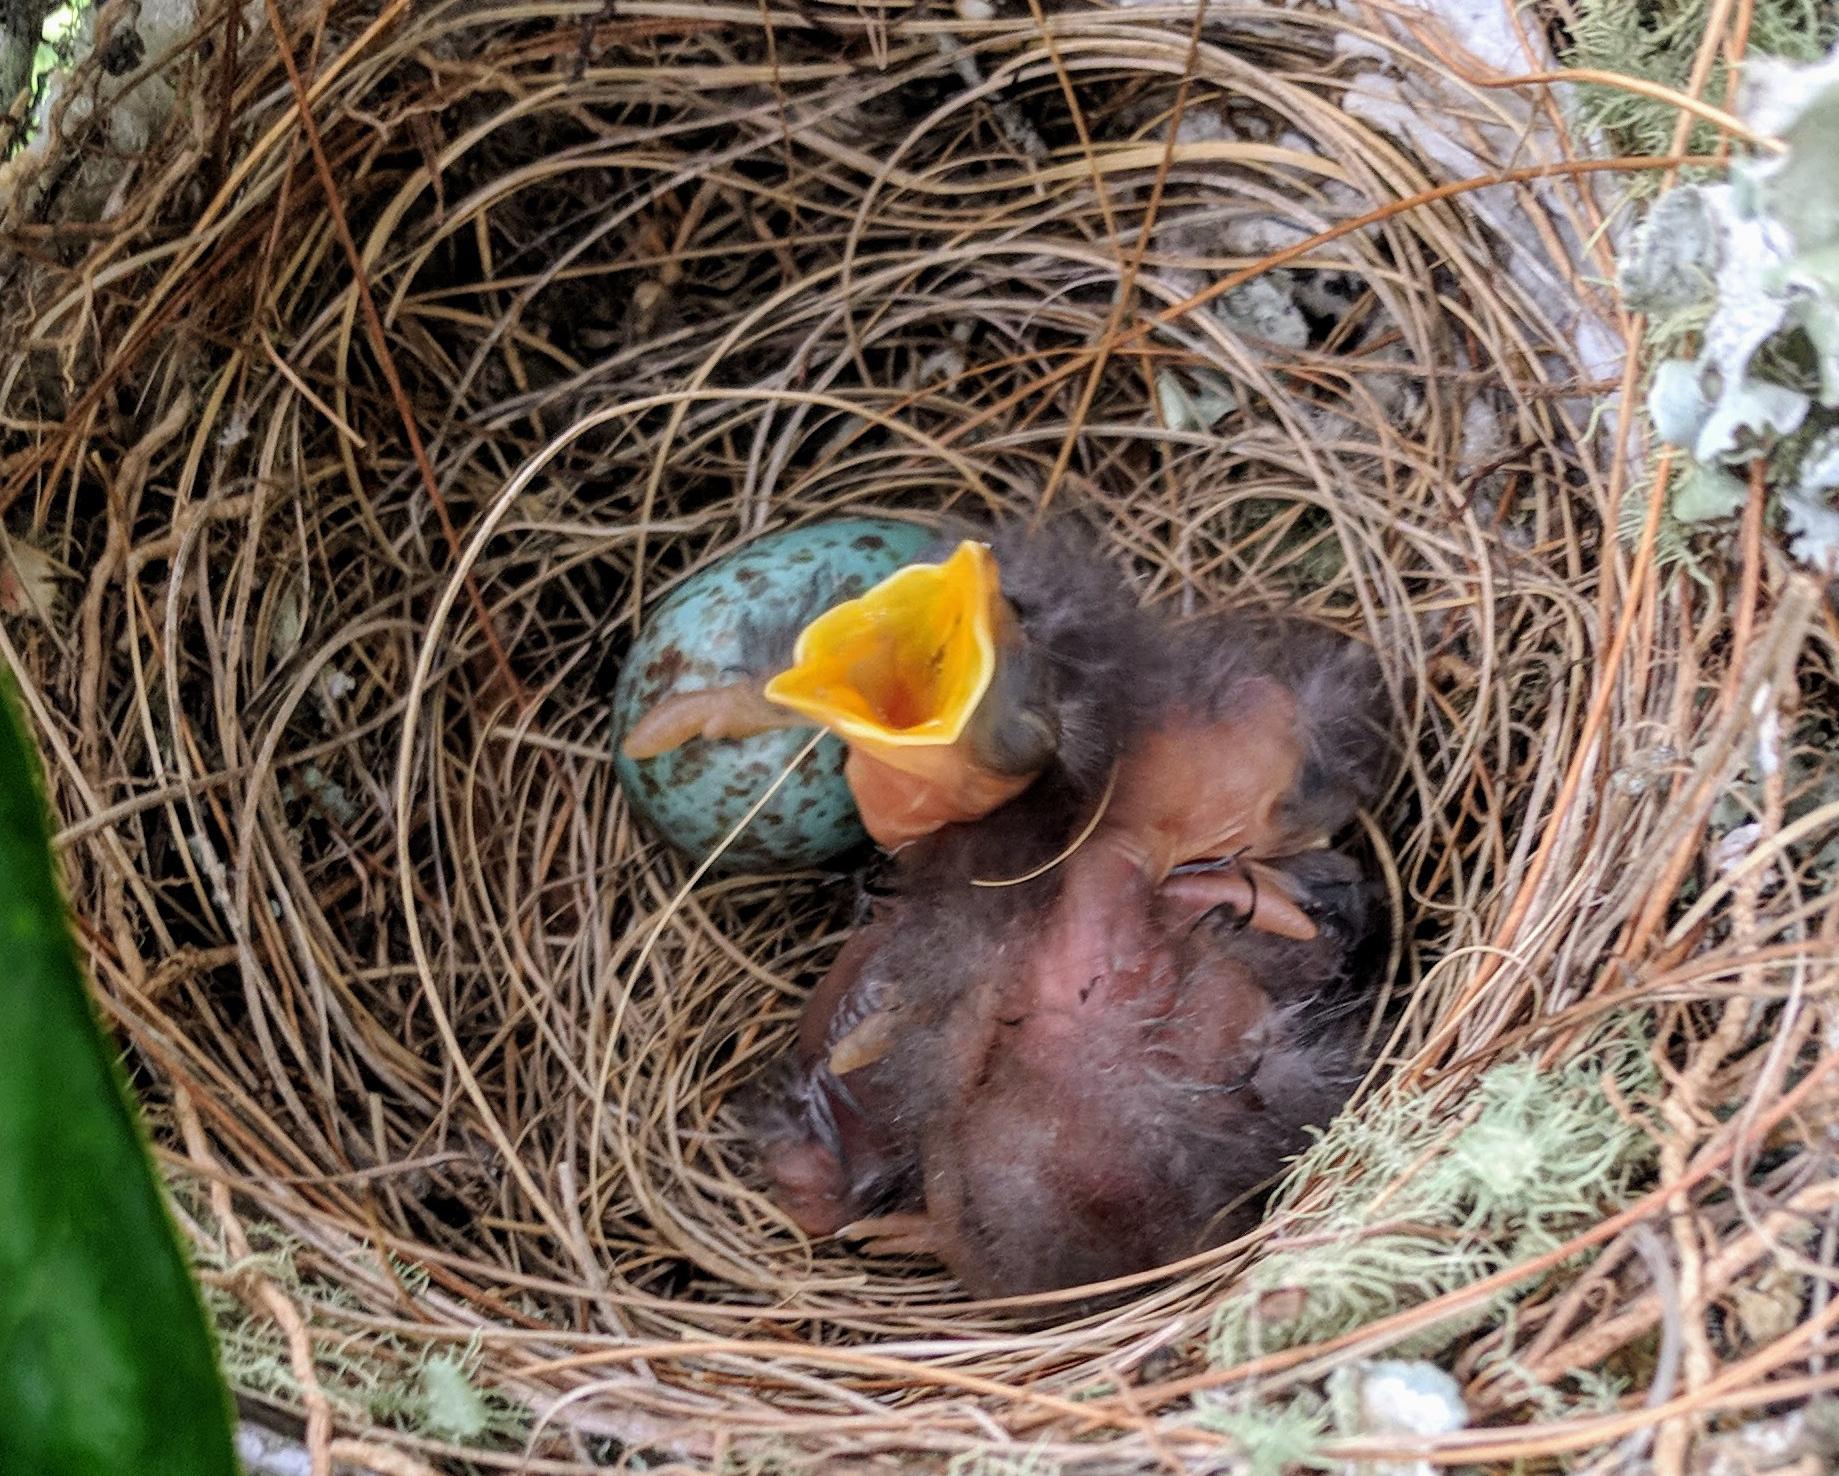 Mockingbird hatchling